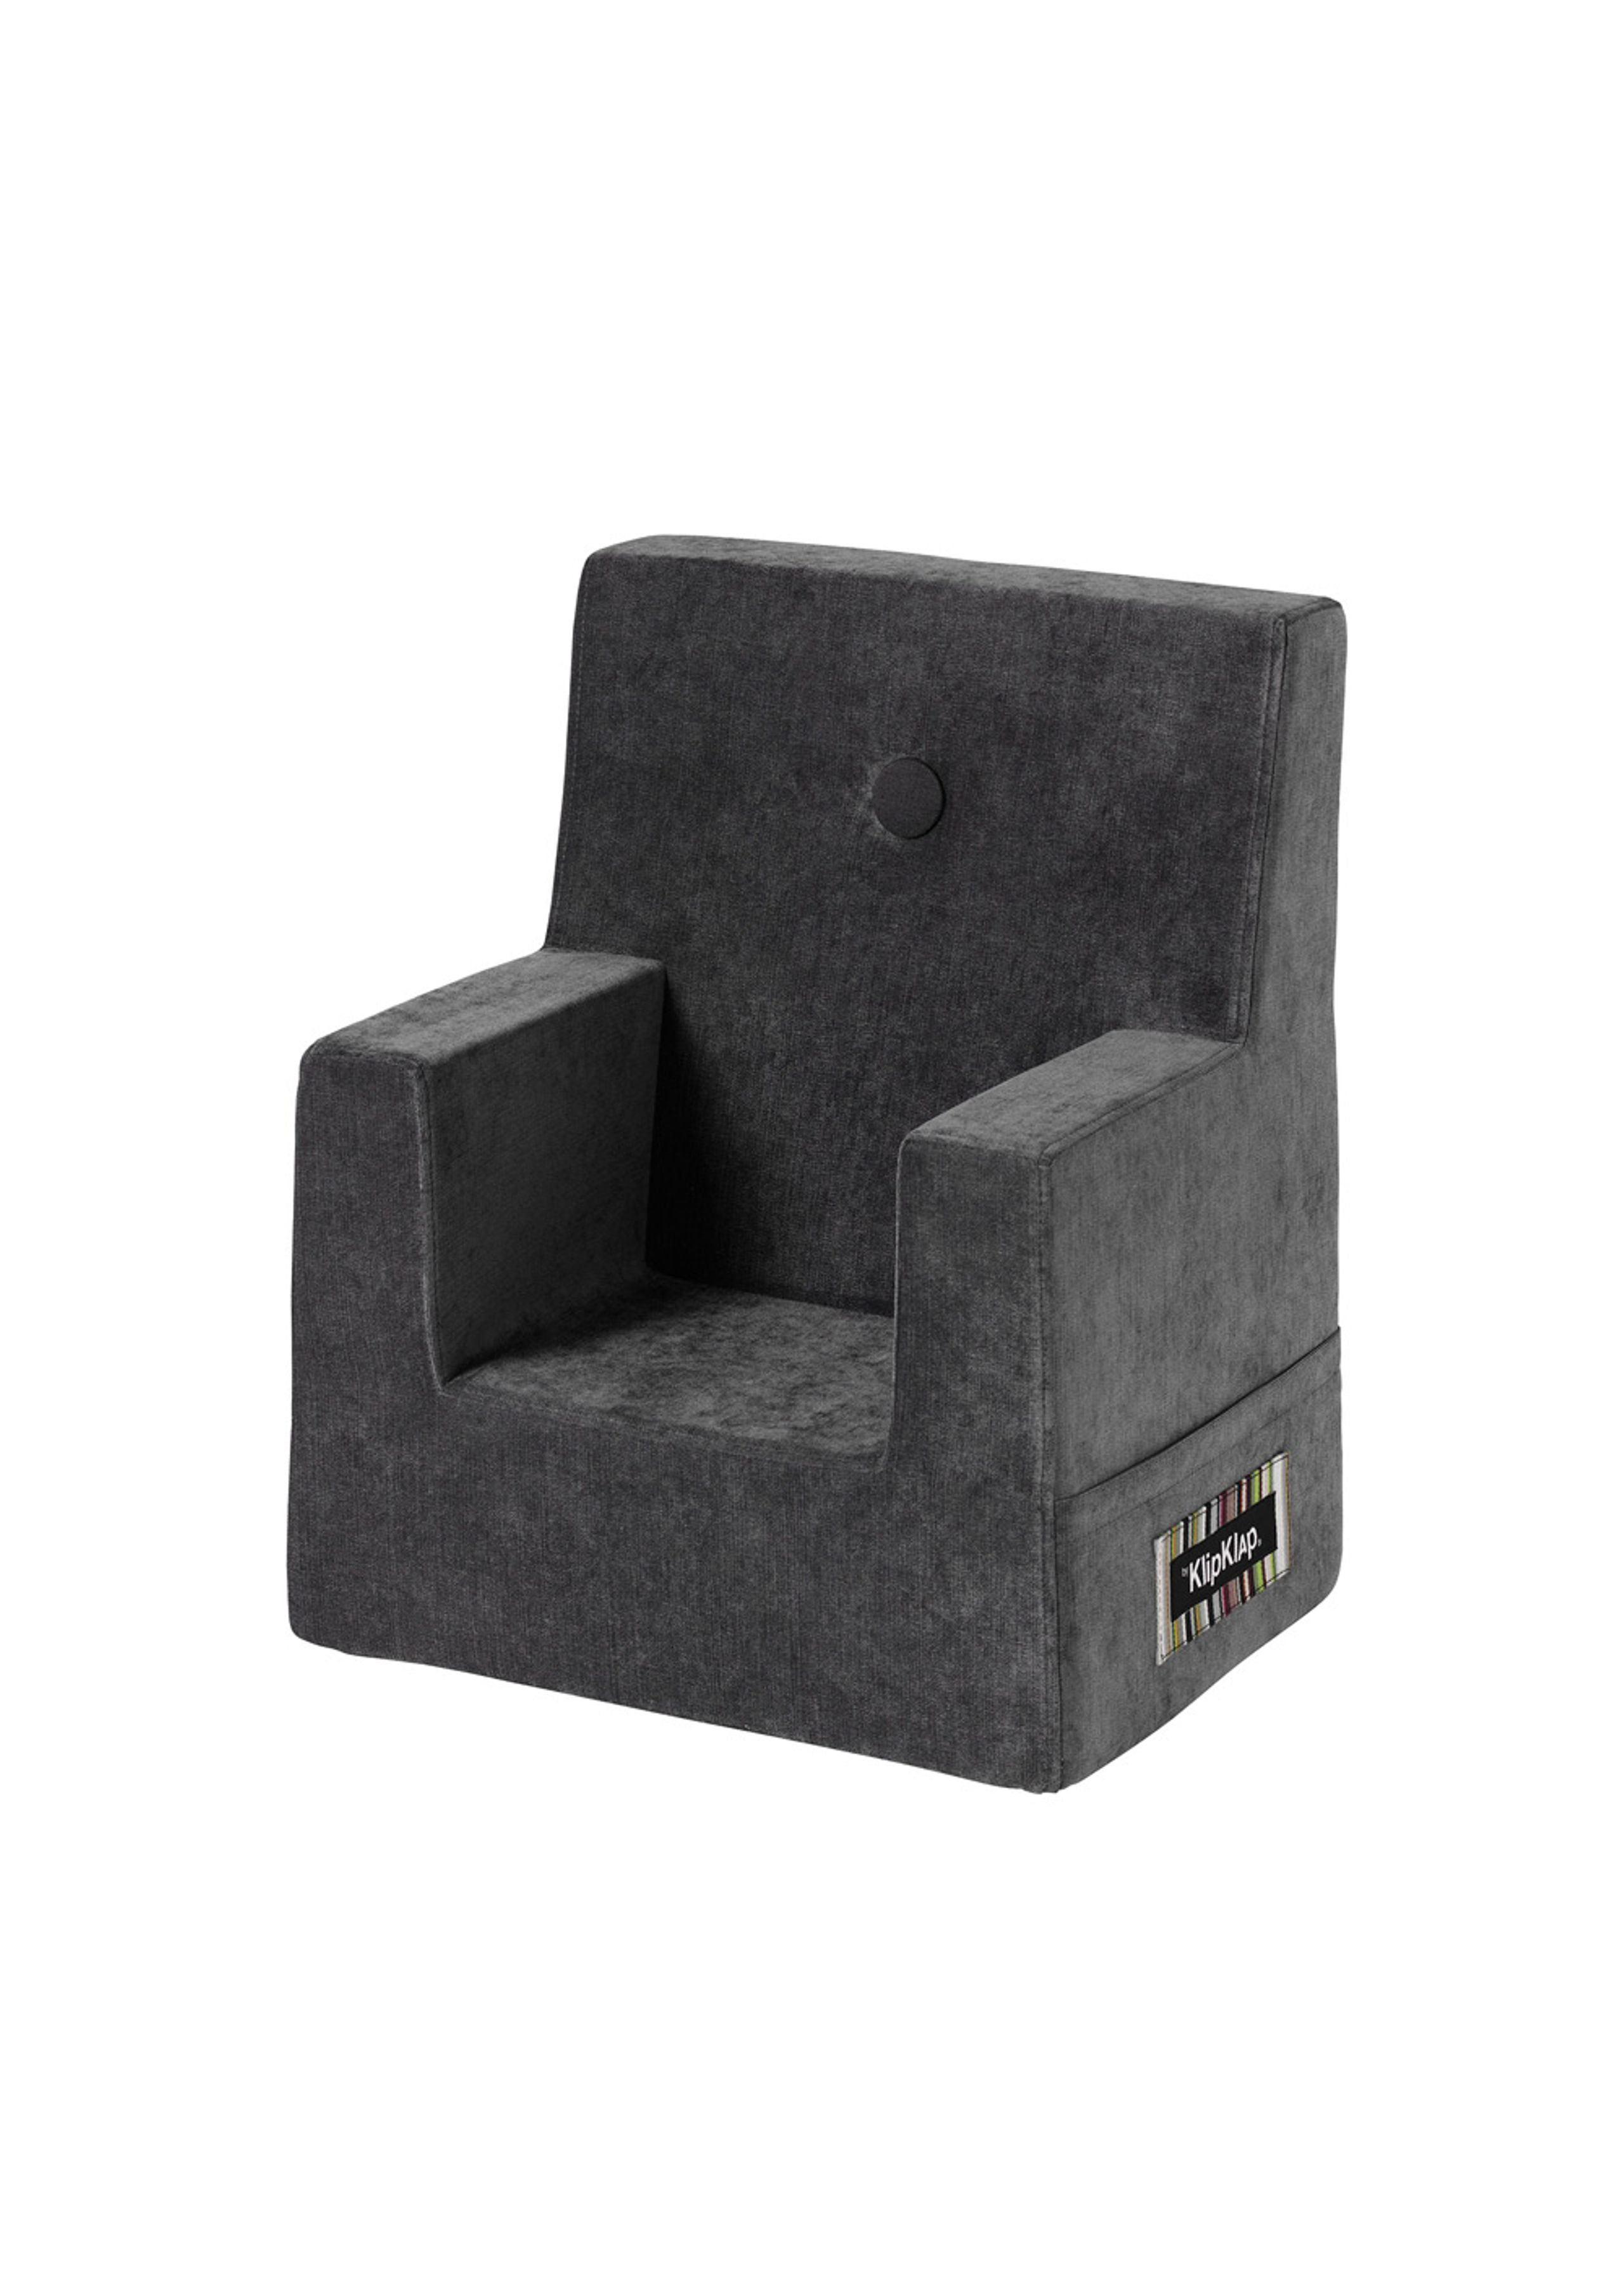 Image of   KK Kids Chair